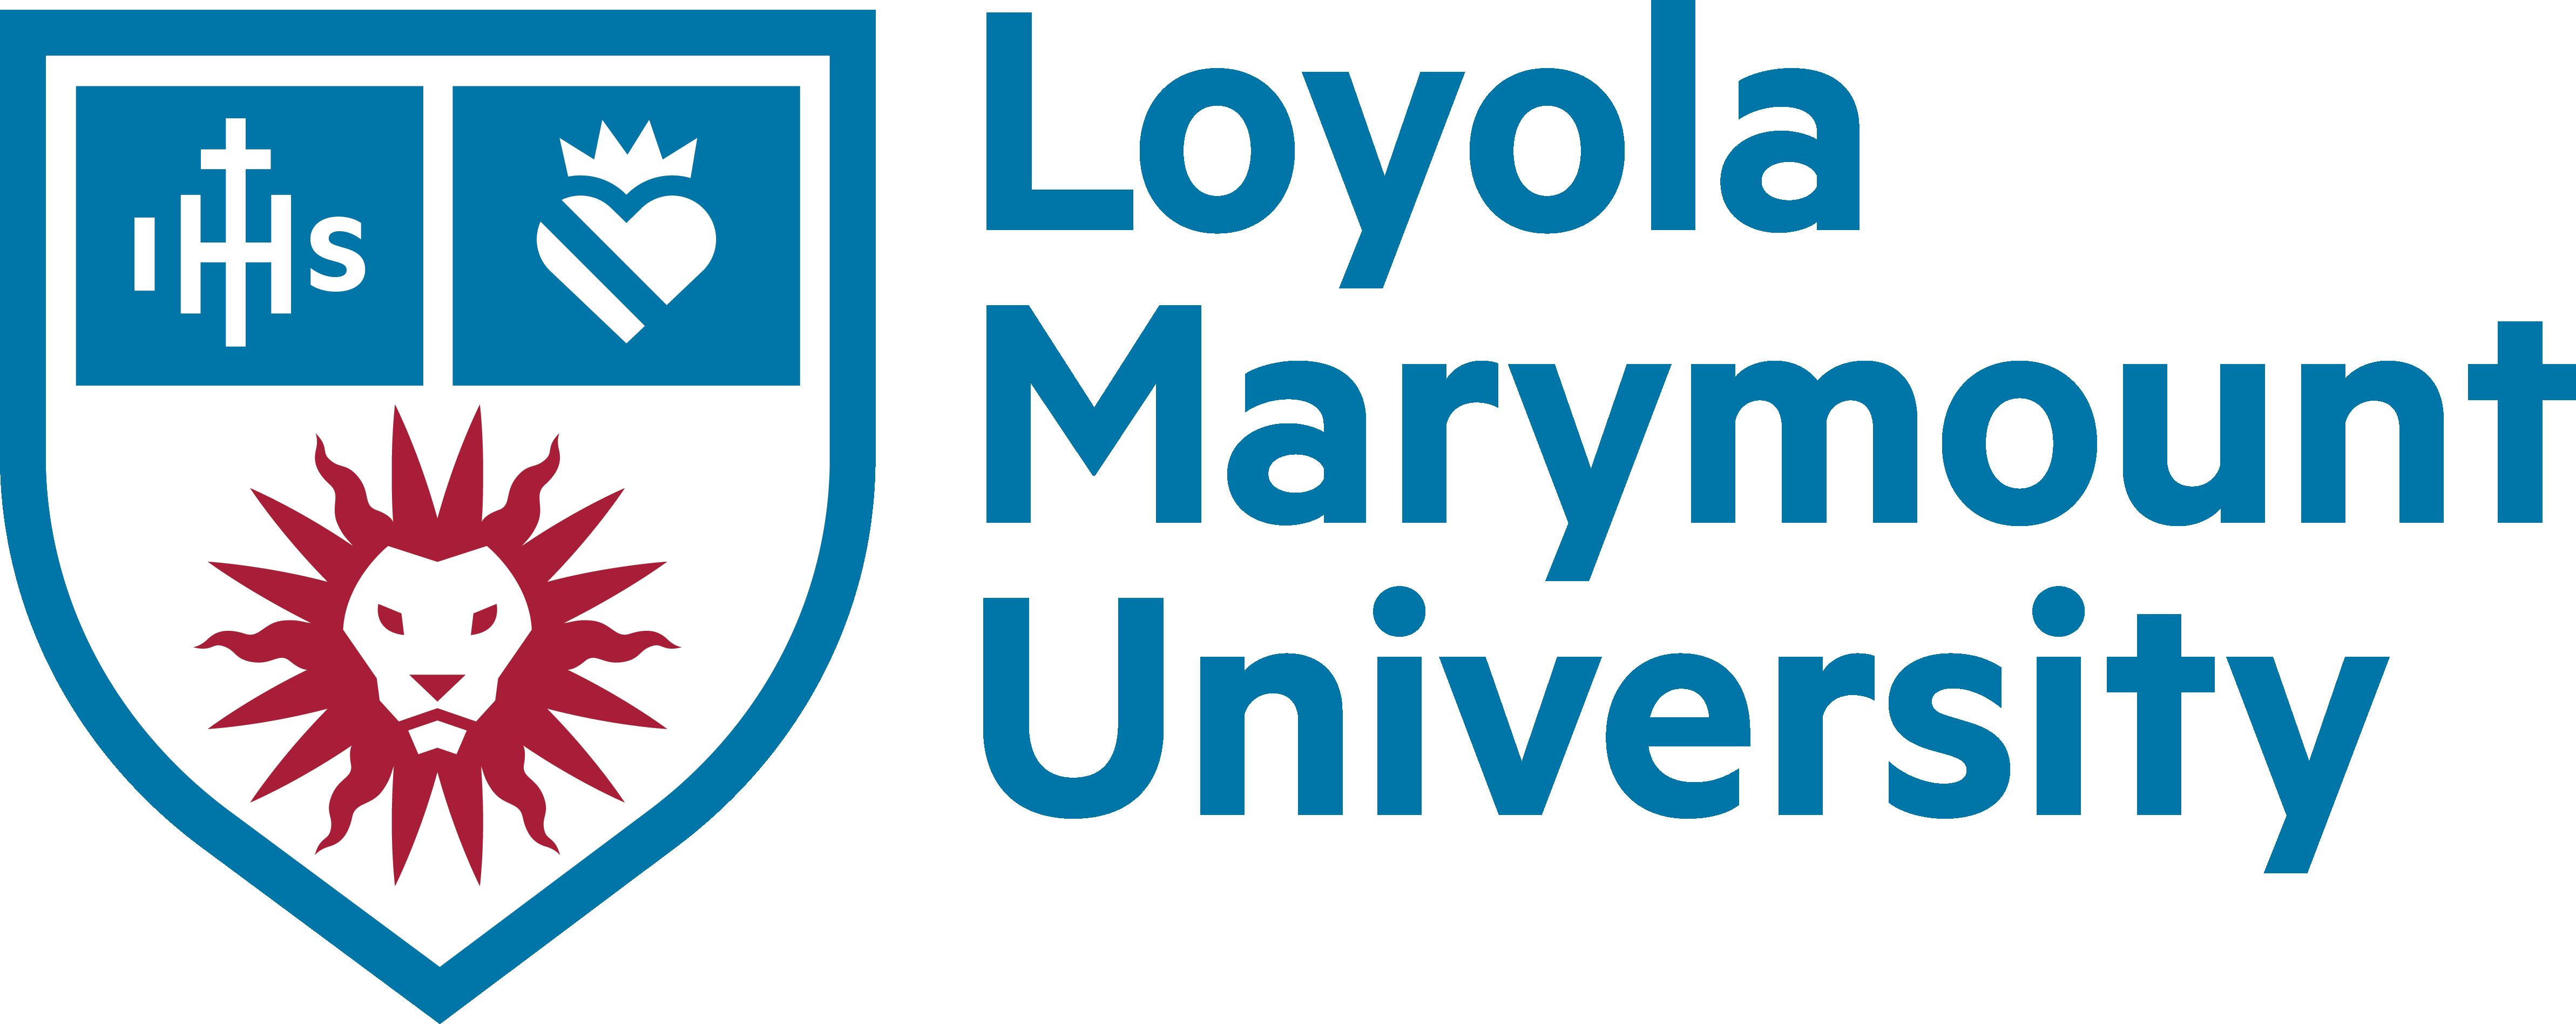 LMU_UniversityLogo_Lockup_Fullname-LeftAligned_PMS-RedBlue